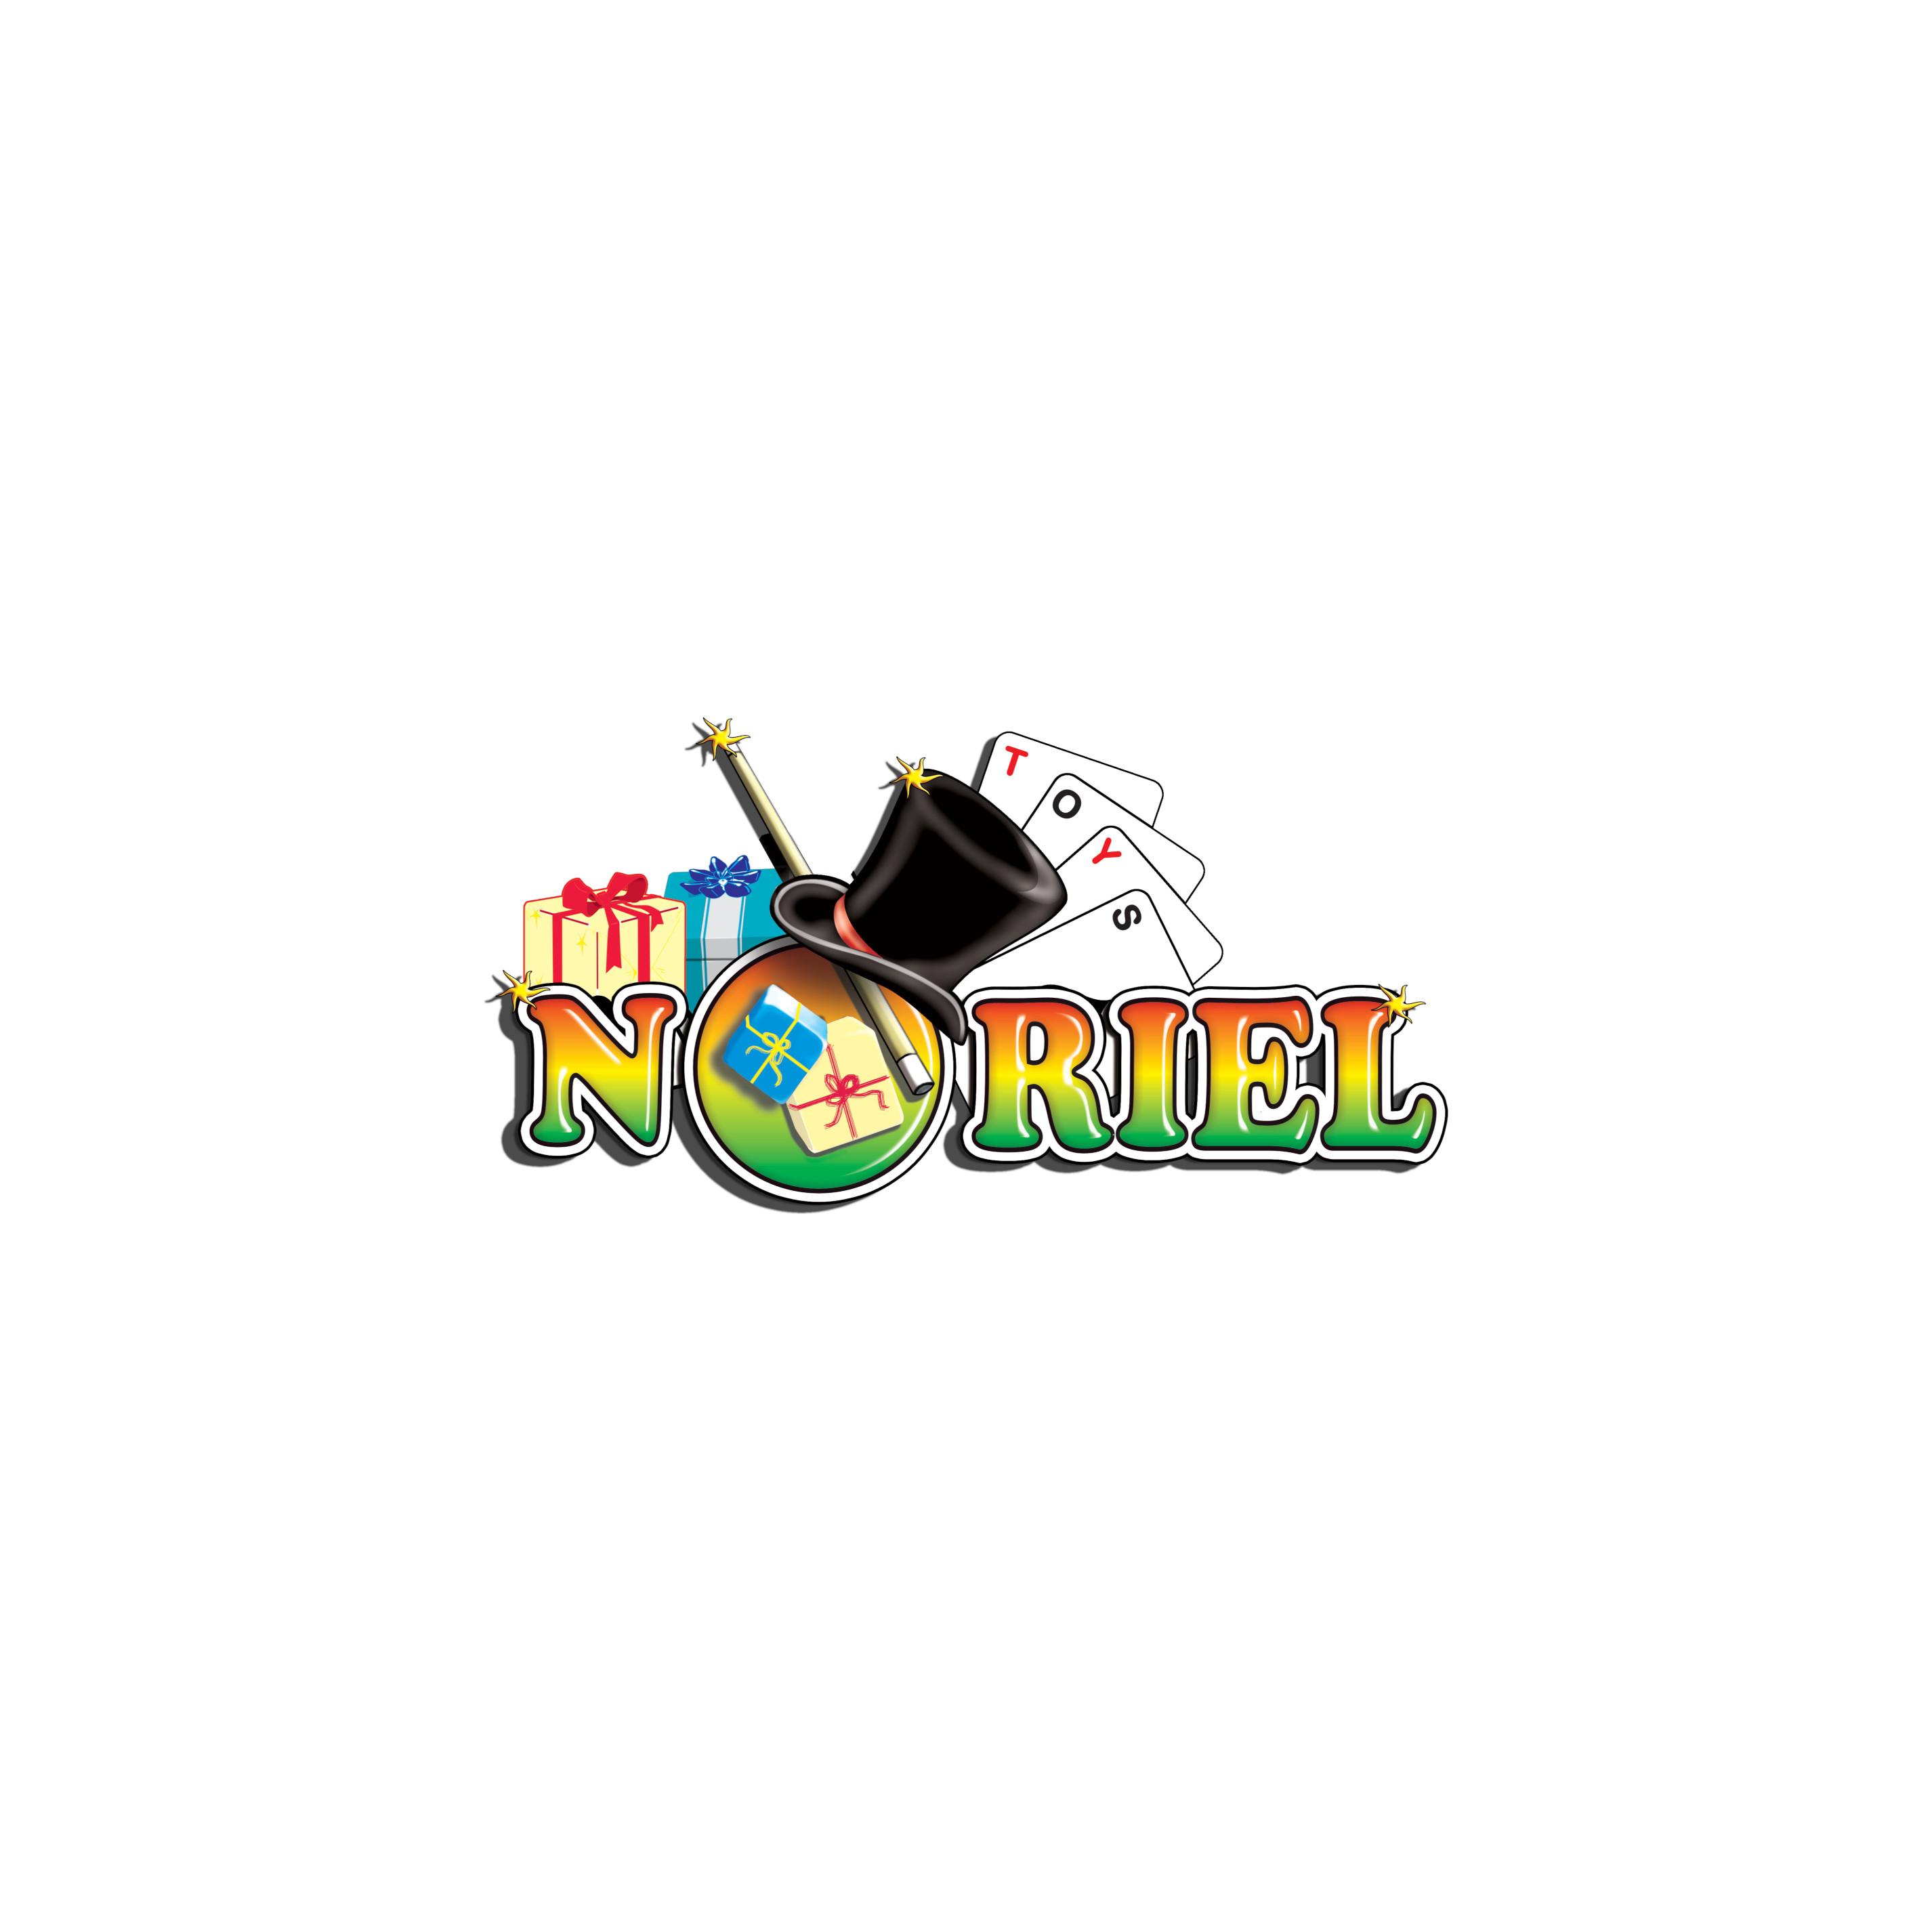 K360TS_001w Set muzical cu 7 instrumente Toy Story 4